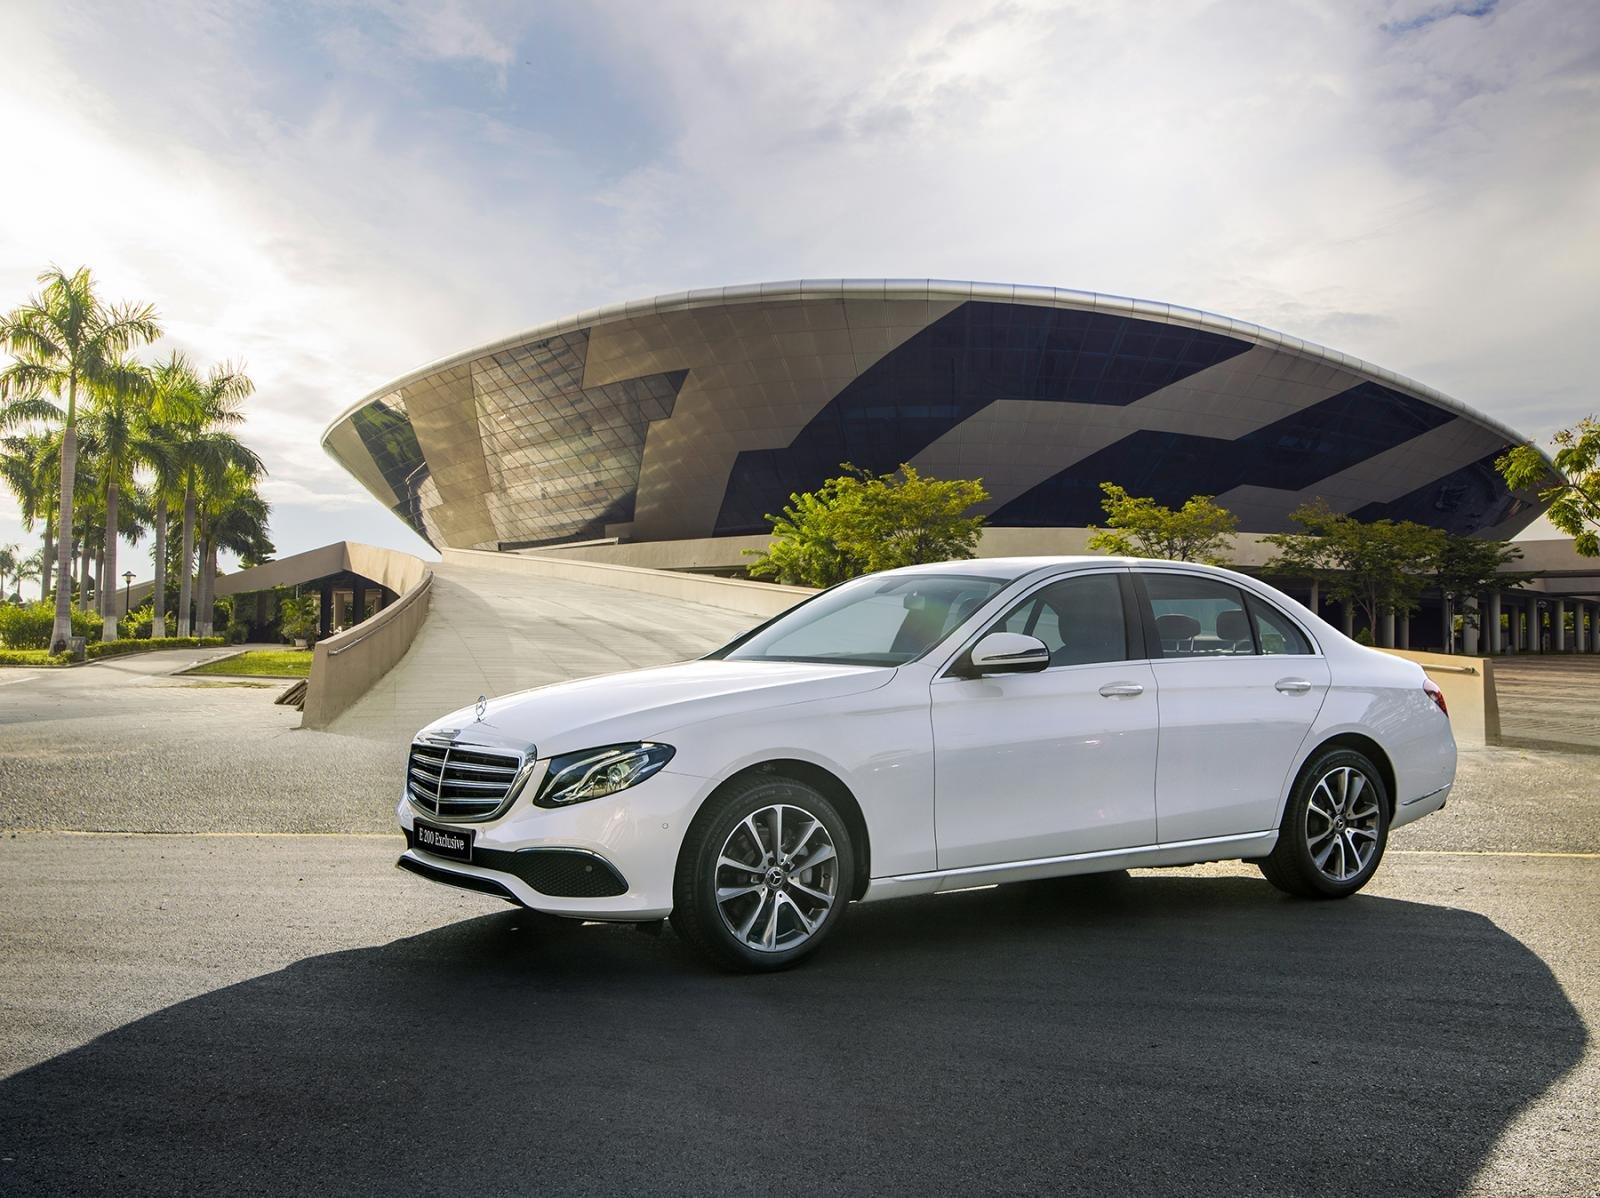 Thông số kỹ thuật xe Mercedes-Benz E 200 Exclusive 2020